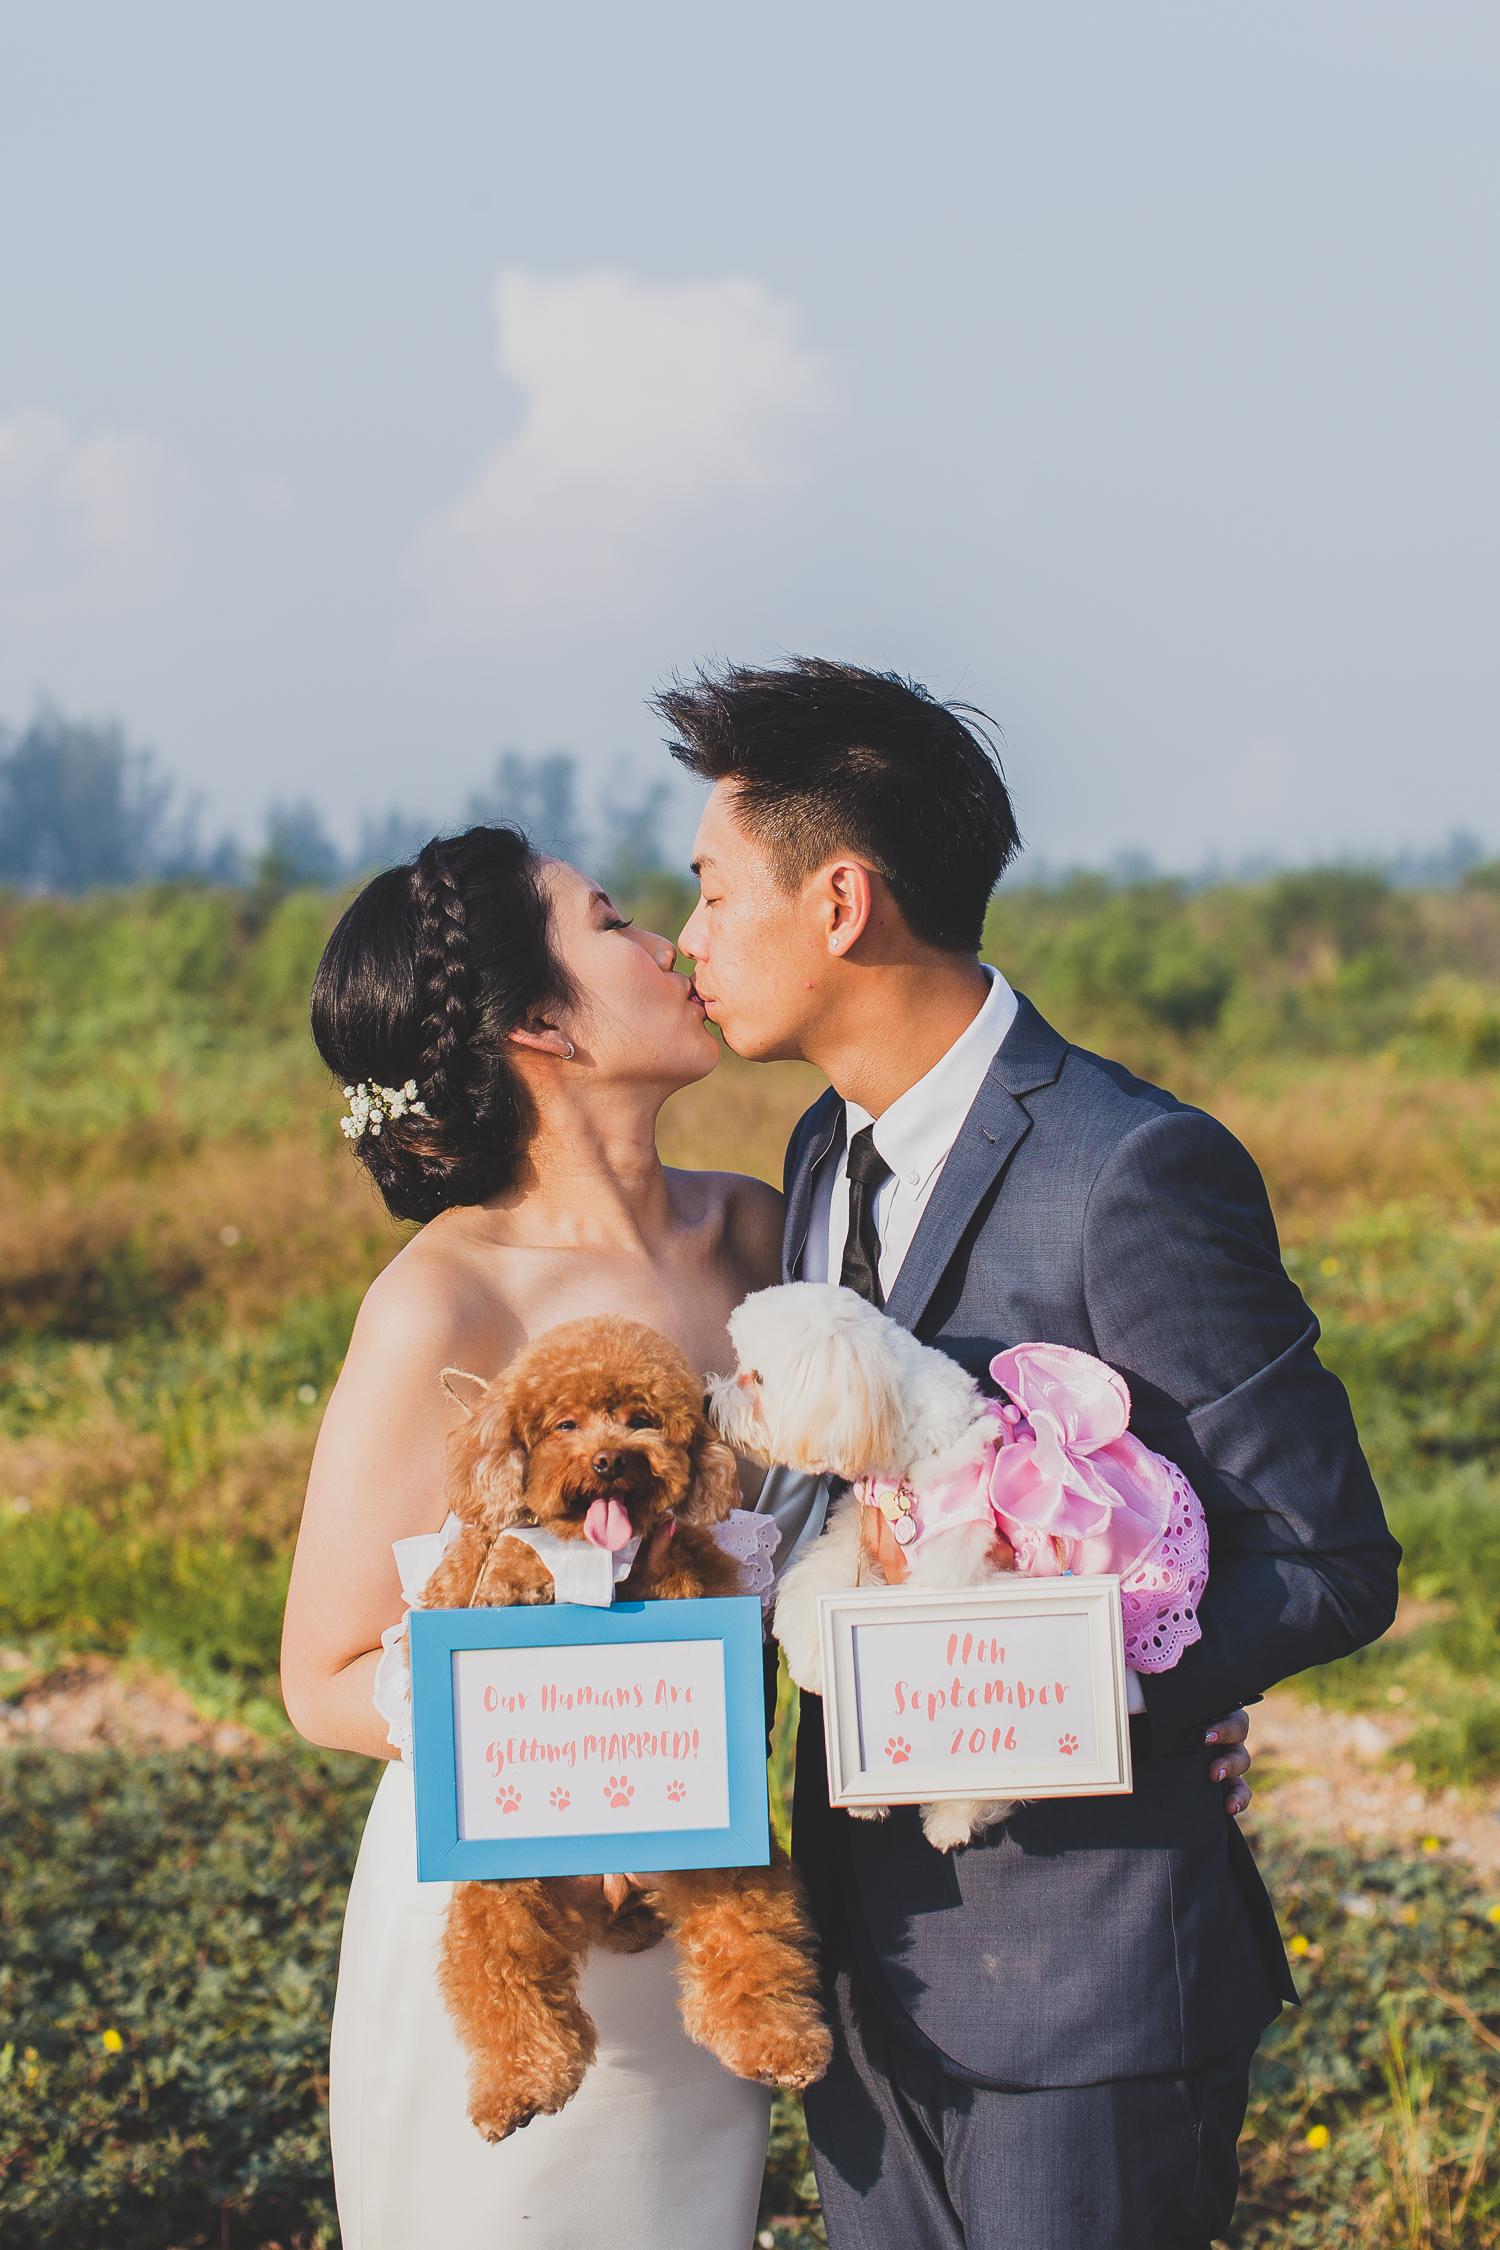 Singapore+Pre+Wedding+Photographer+Ziyang+Clara-0012.jpg